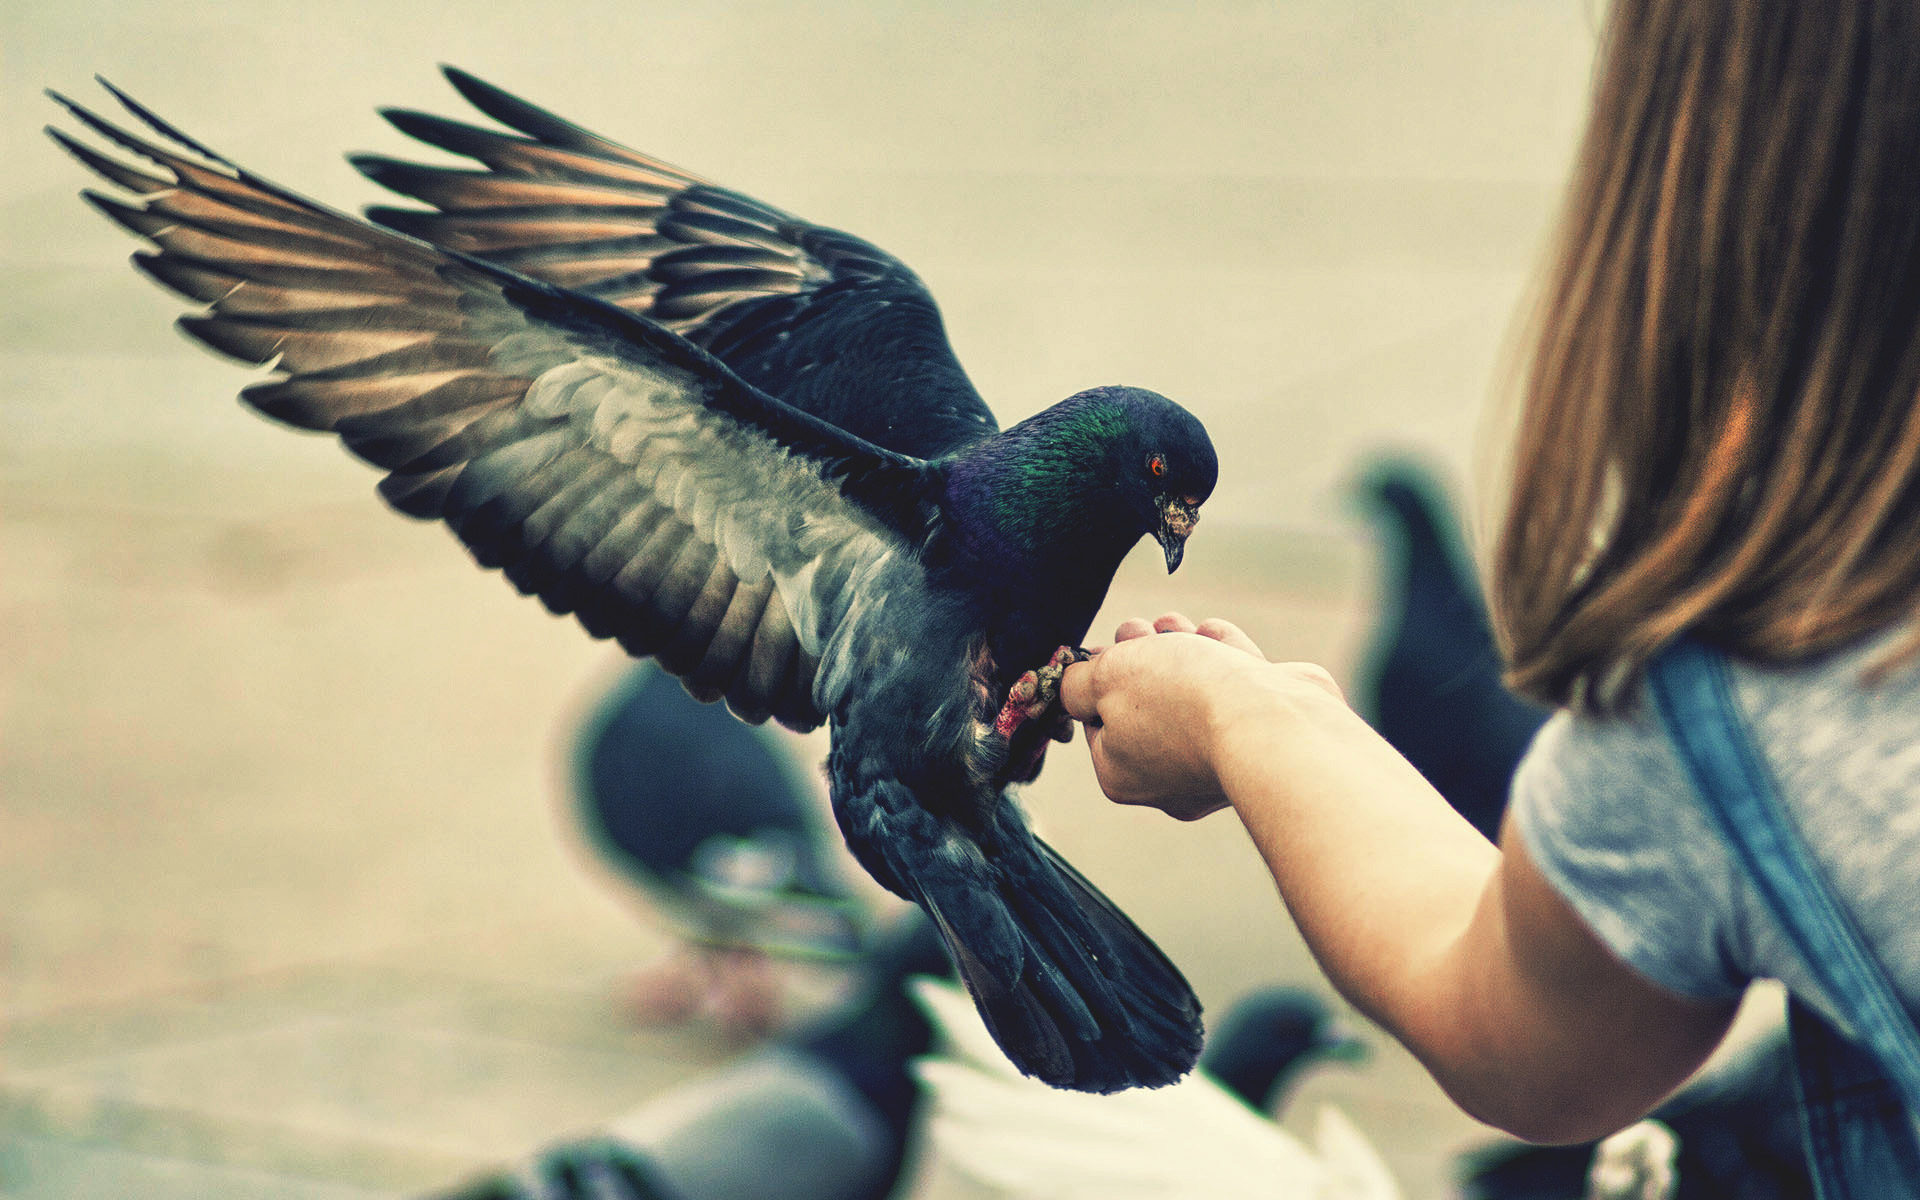 stunning bird in hand wallpaper 39529